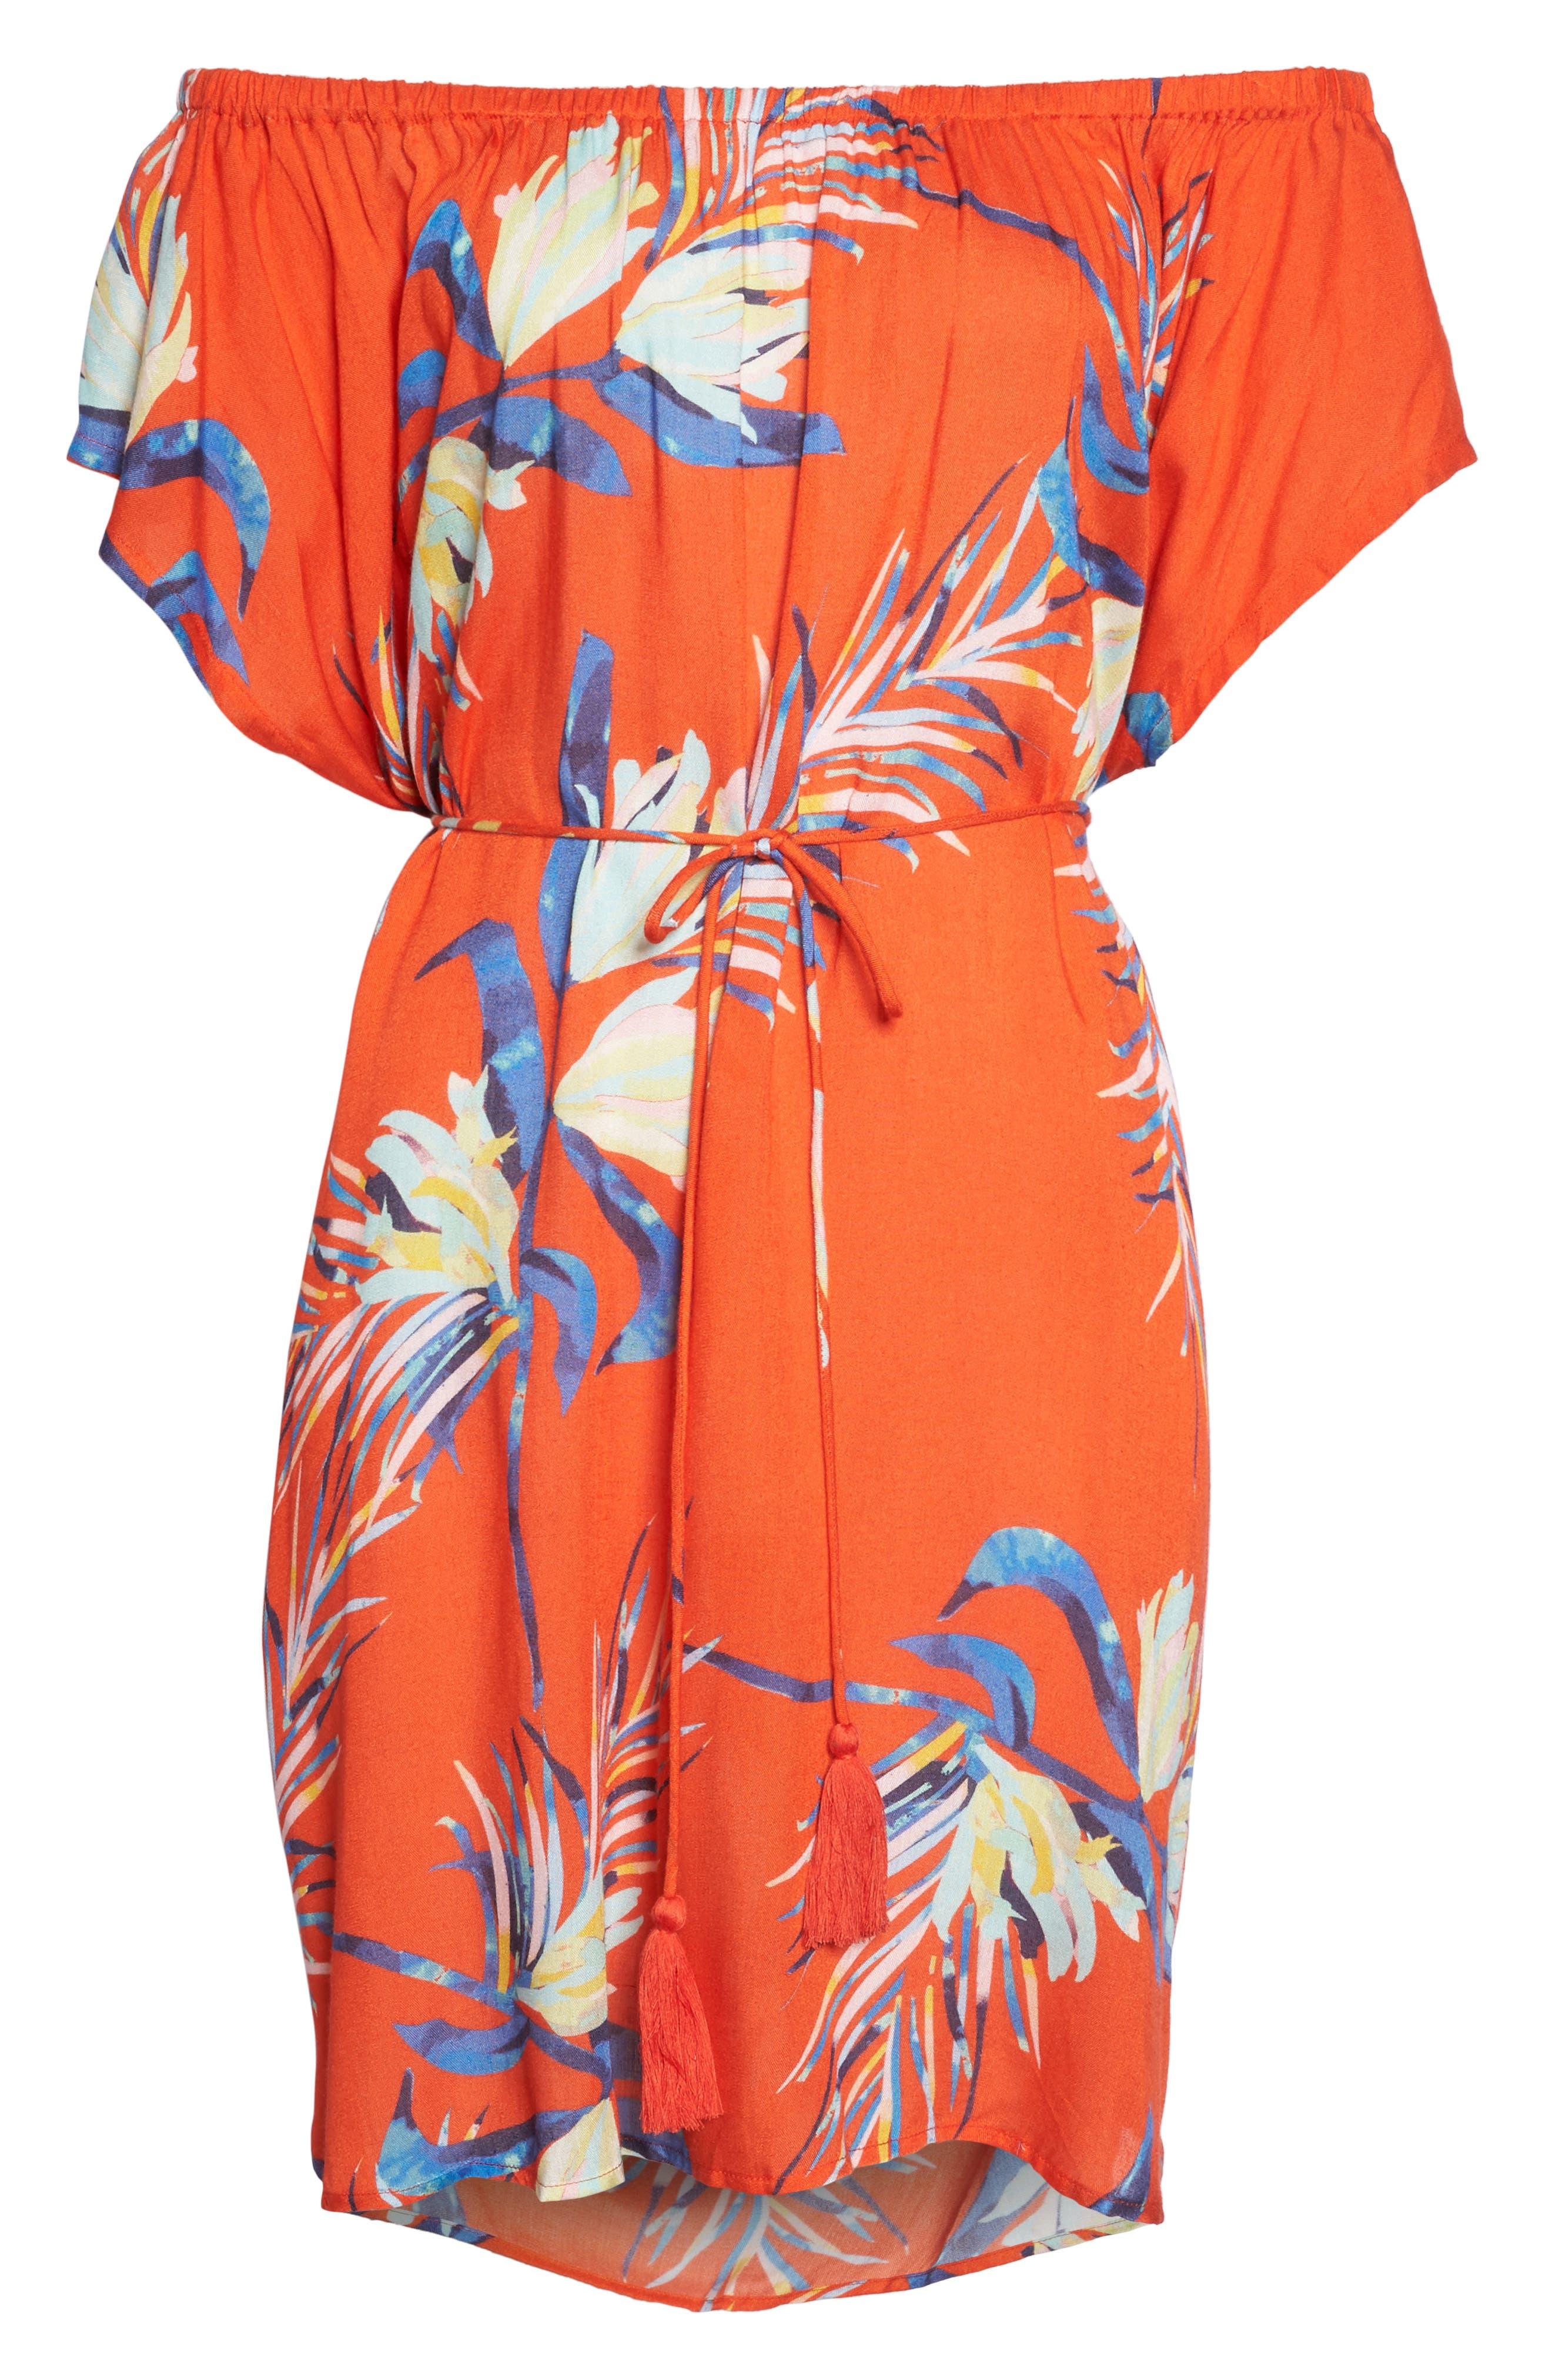 Paradise Palm Off the Shoulder Cover-Up Dress,                             Alternate thumbnail 6, color,                             Tangerine